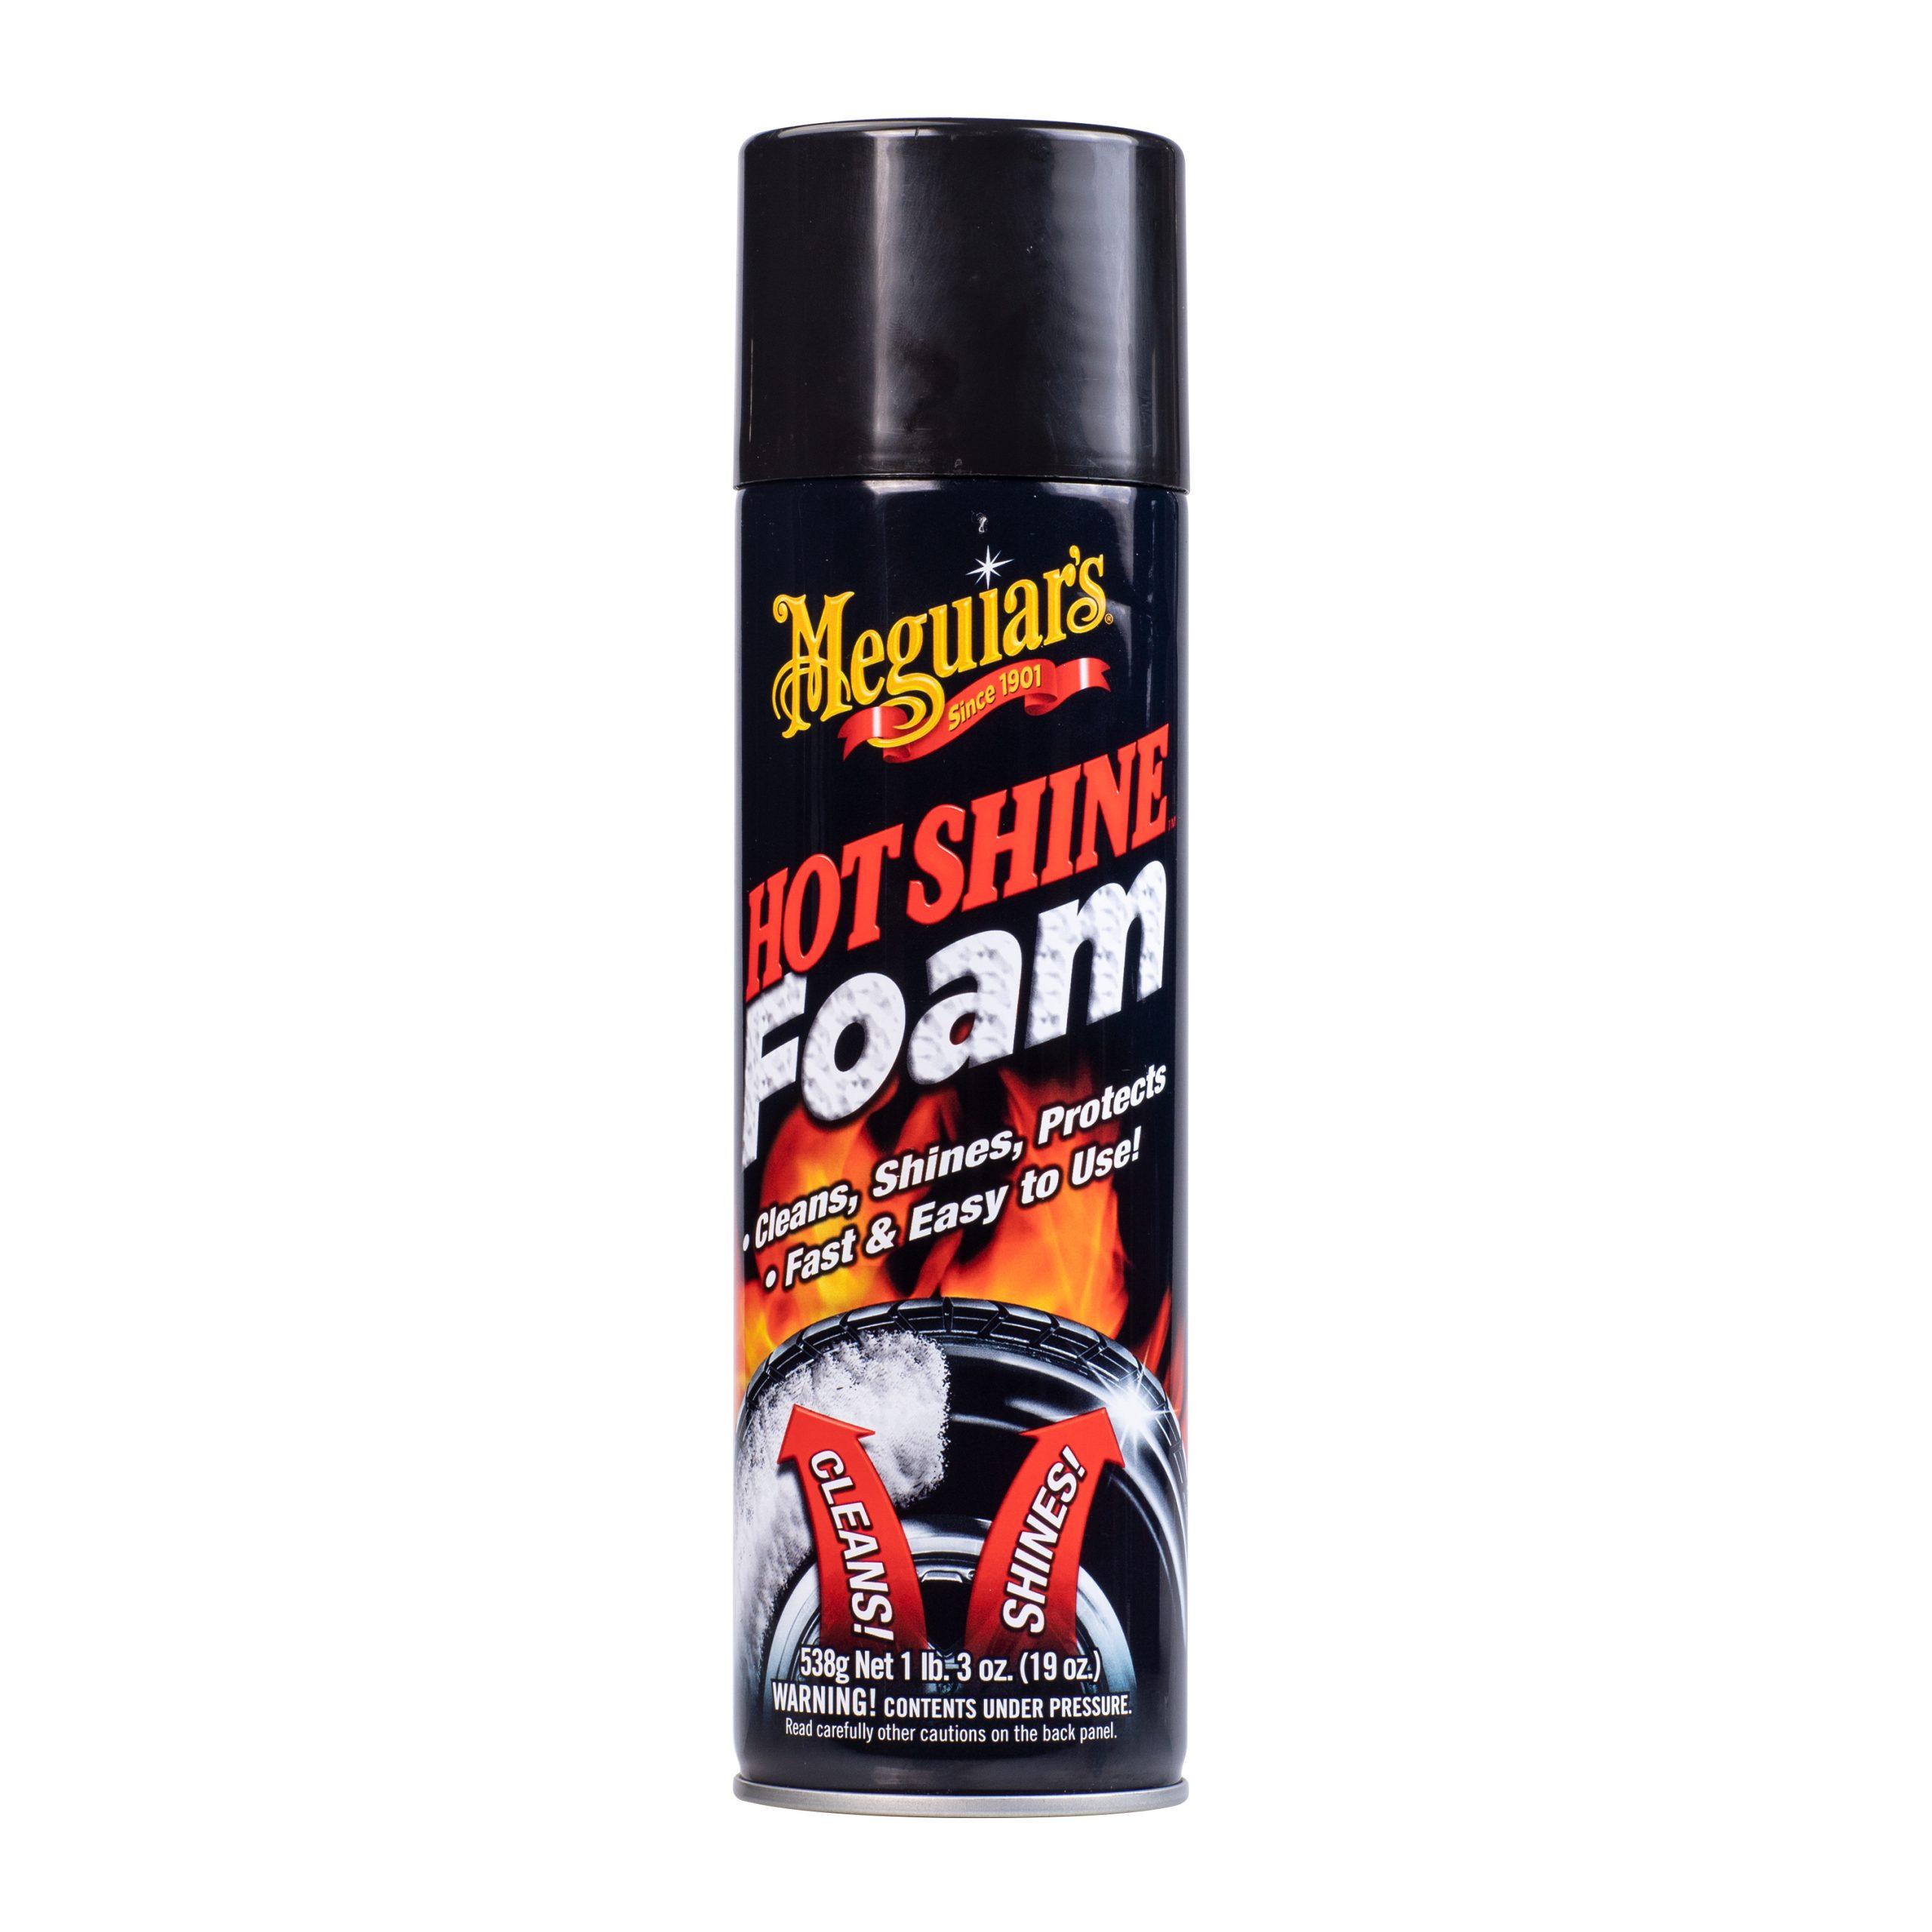 meguiars hot shine foam